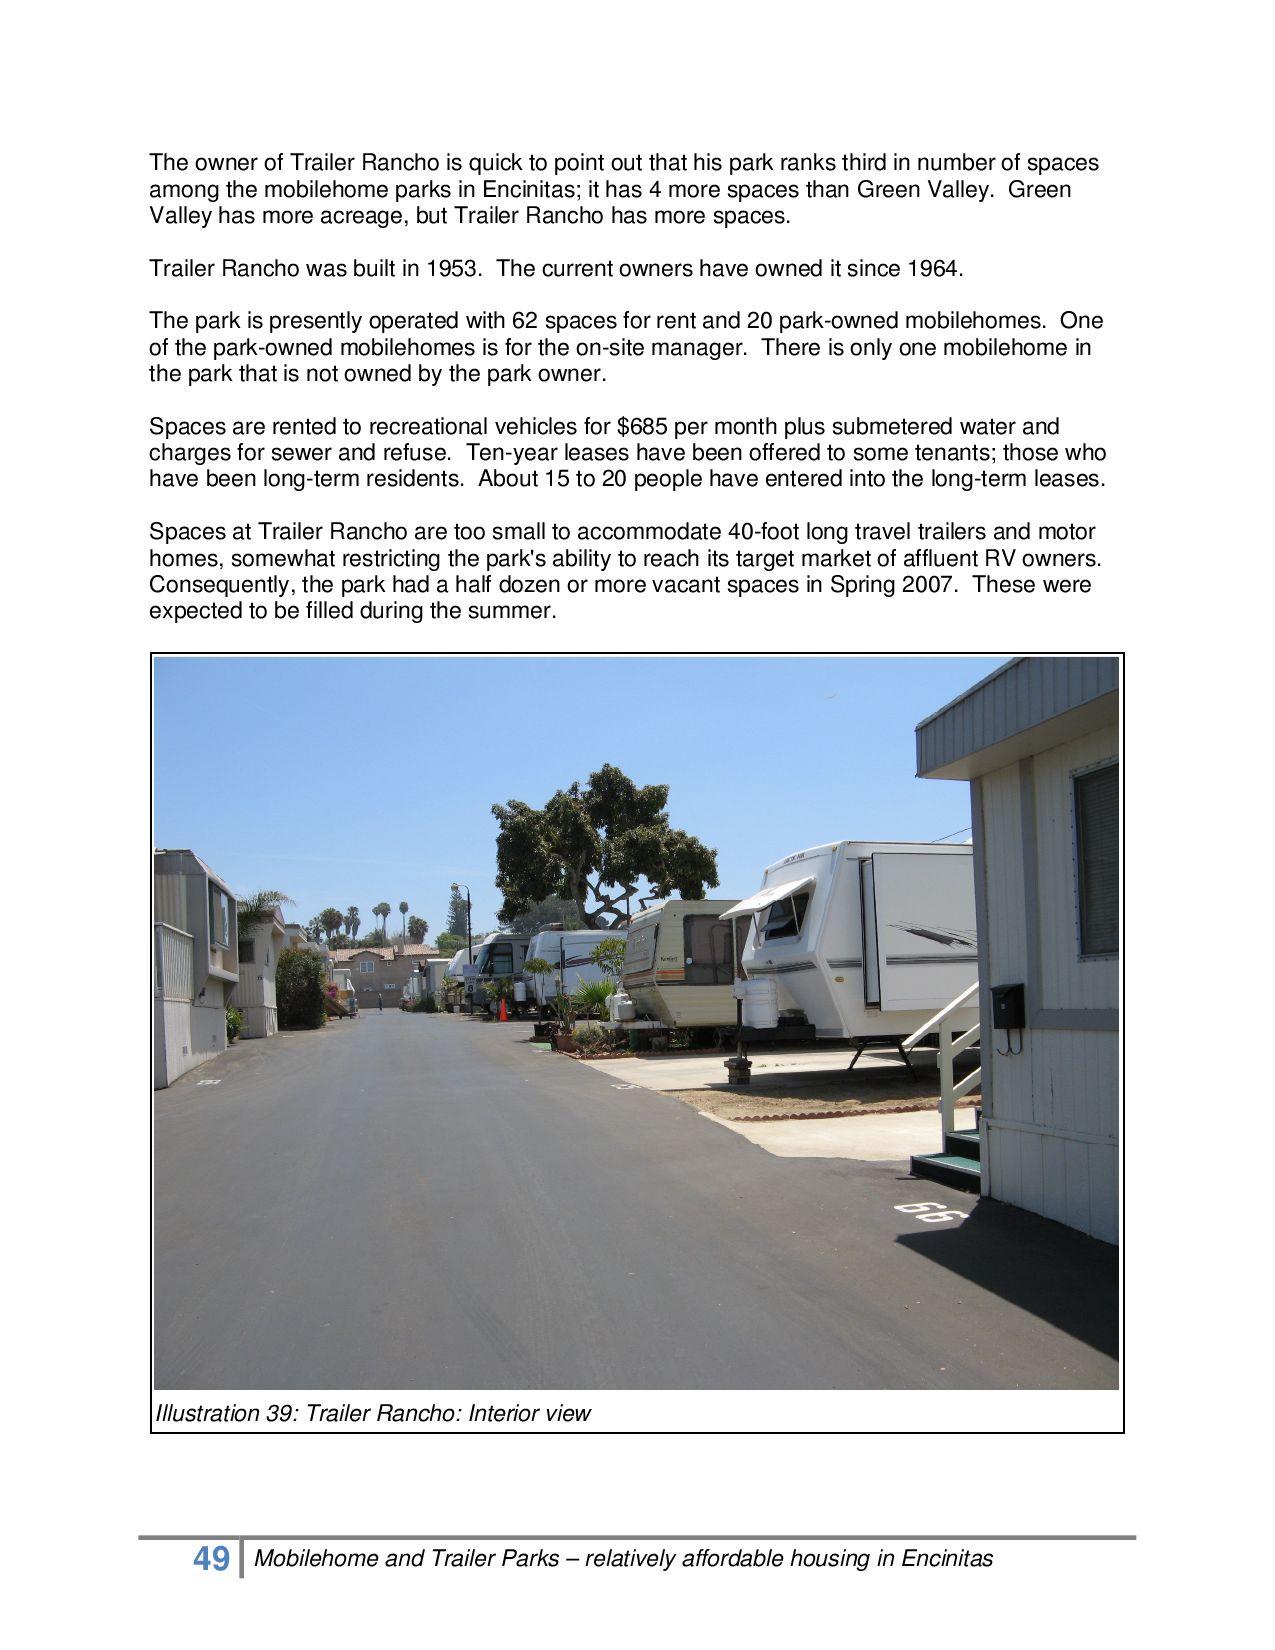 Encinitas Mobilehome And Trailer Park Study